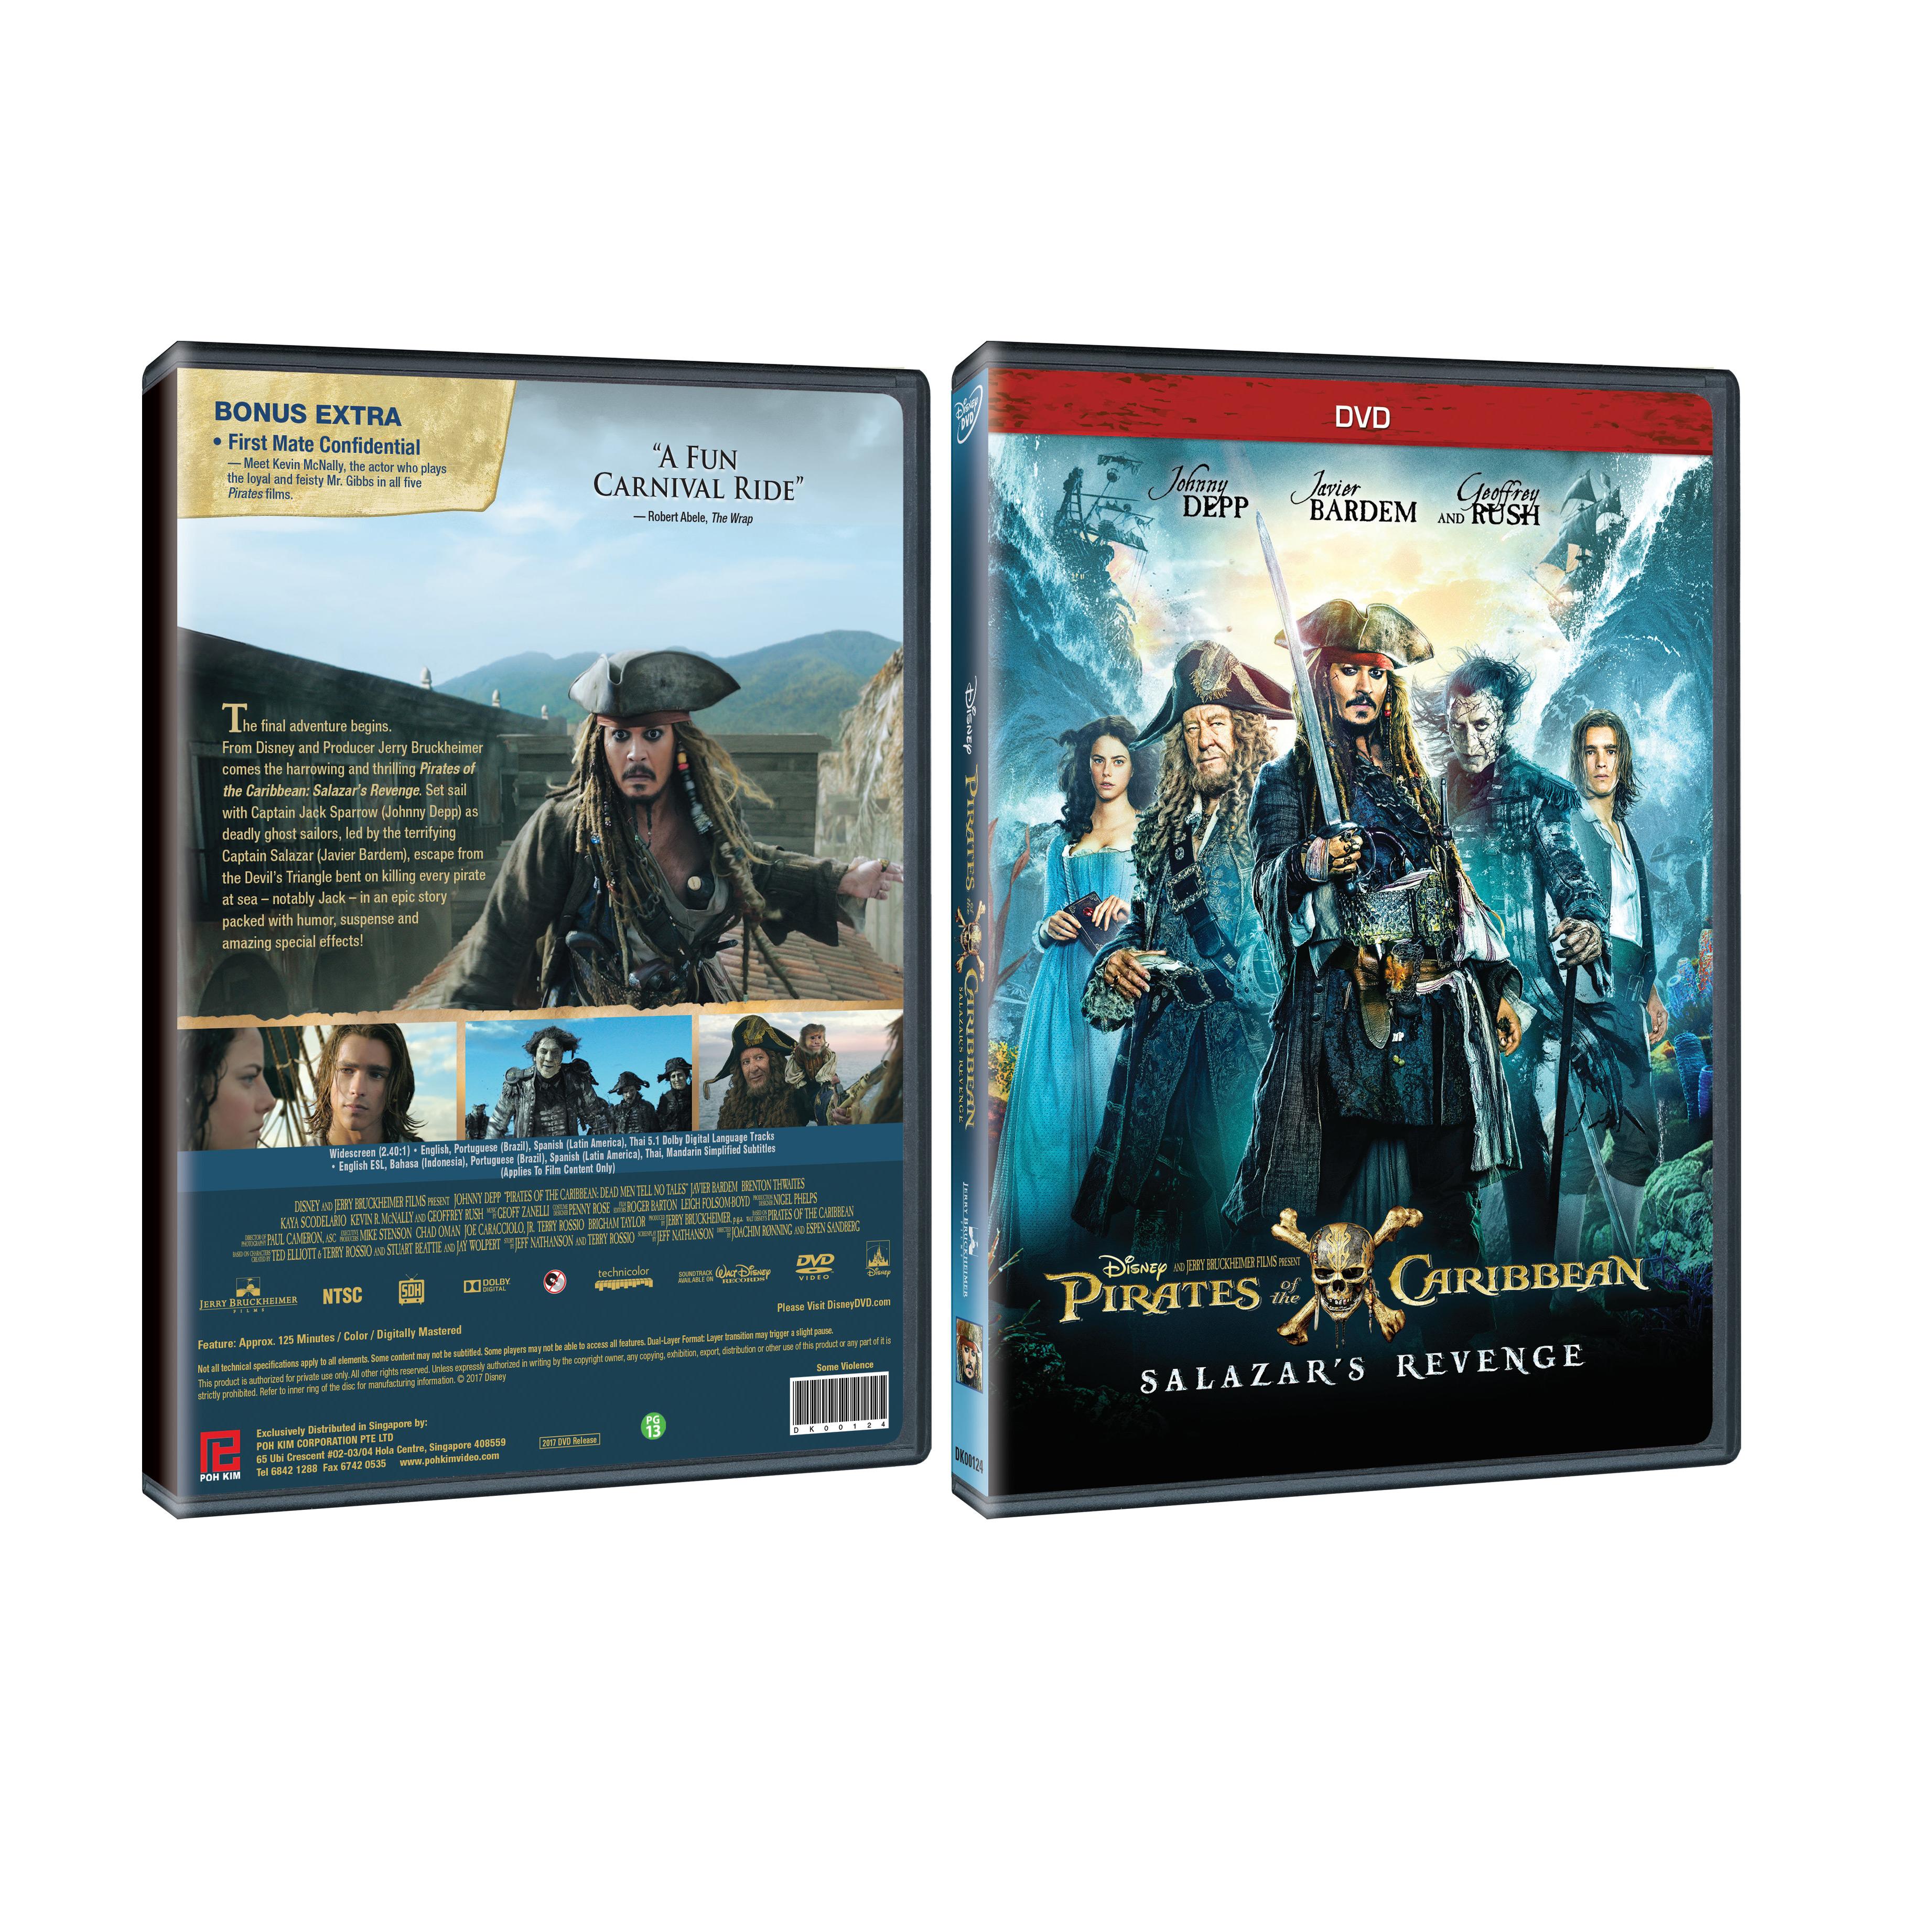 Disney movies  Pirates of the Caribbean  Salazar s Revenge (DVD).  POTC5-DVD-Packshot ee71e6139ca7d